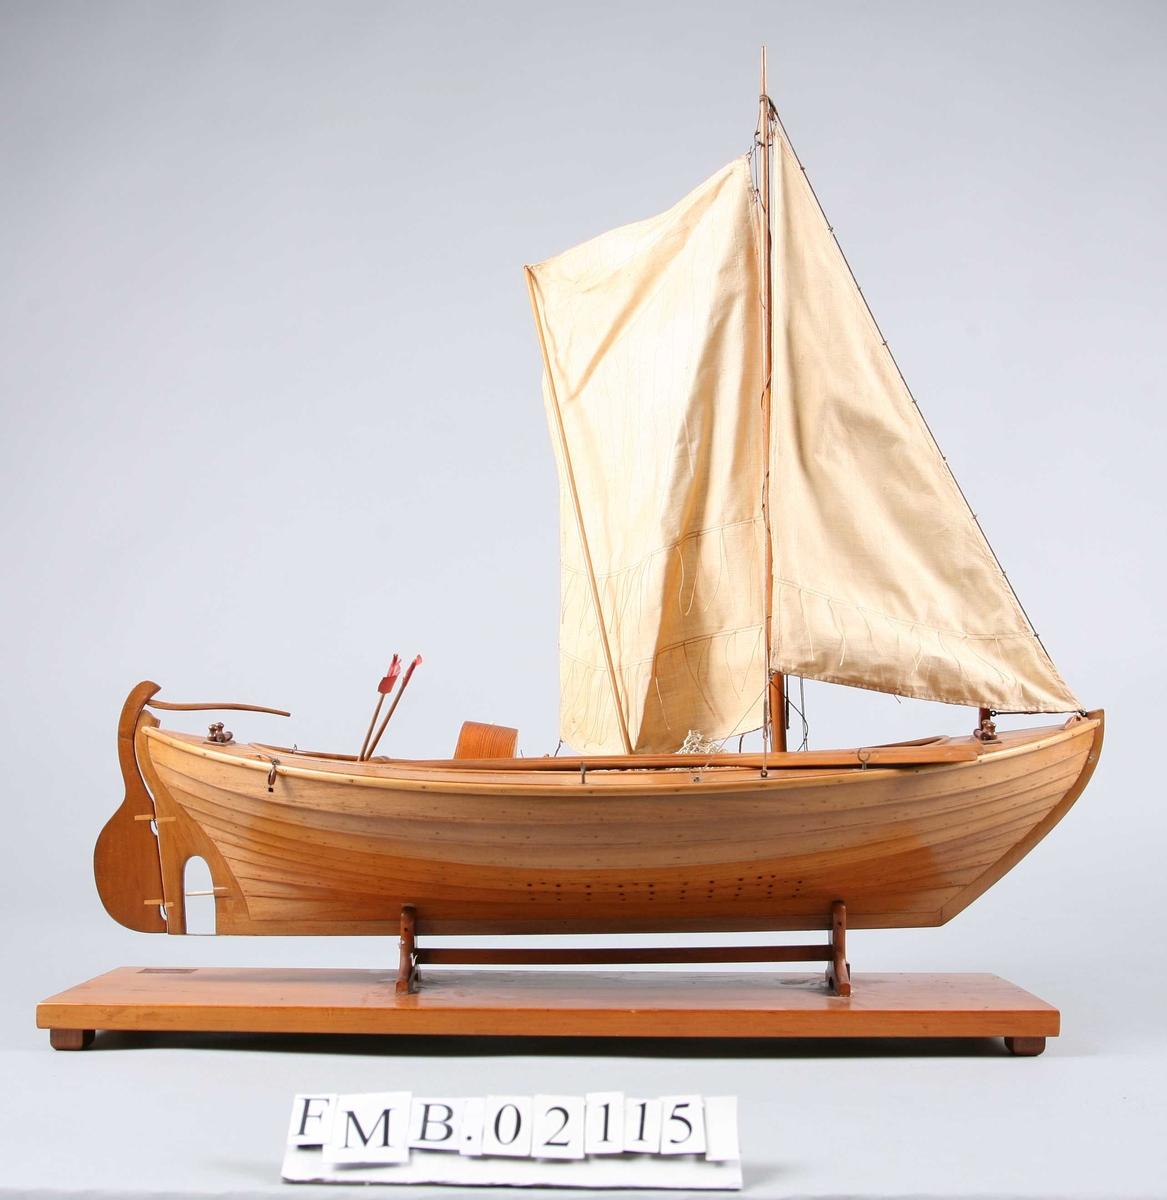 Modellbåt med mast og to seil. Den har 3 årer, 2 bøyer, et garn og en dregg.